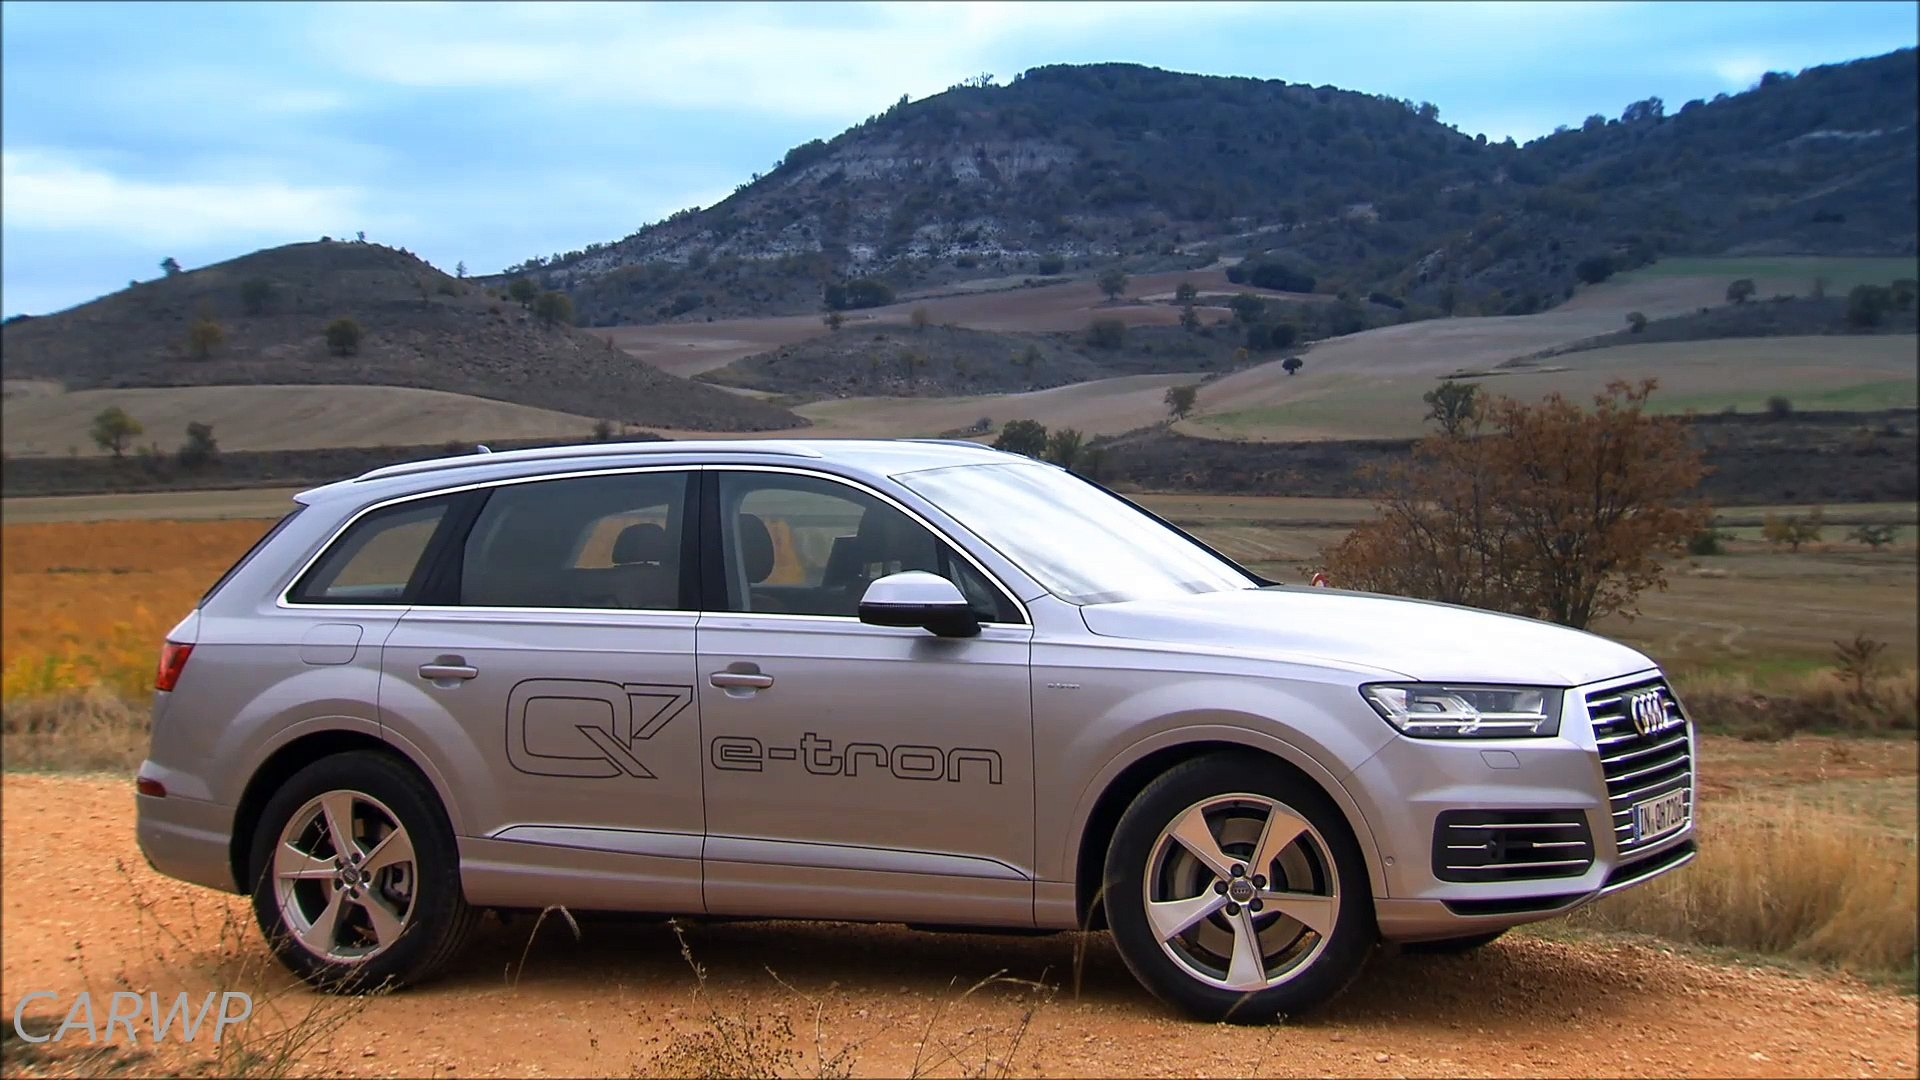 DESIGN Audi Q7 E-Tron Plug-in Hybrid 2015 4x4 aro 19 TDI 373 cv 71,4 mkgf 225 kmh 0-100 kmh 6 s 58,8